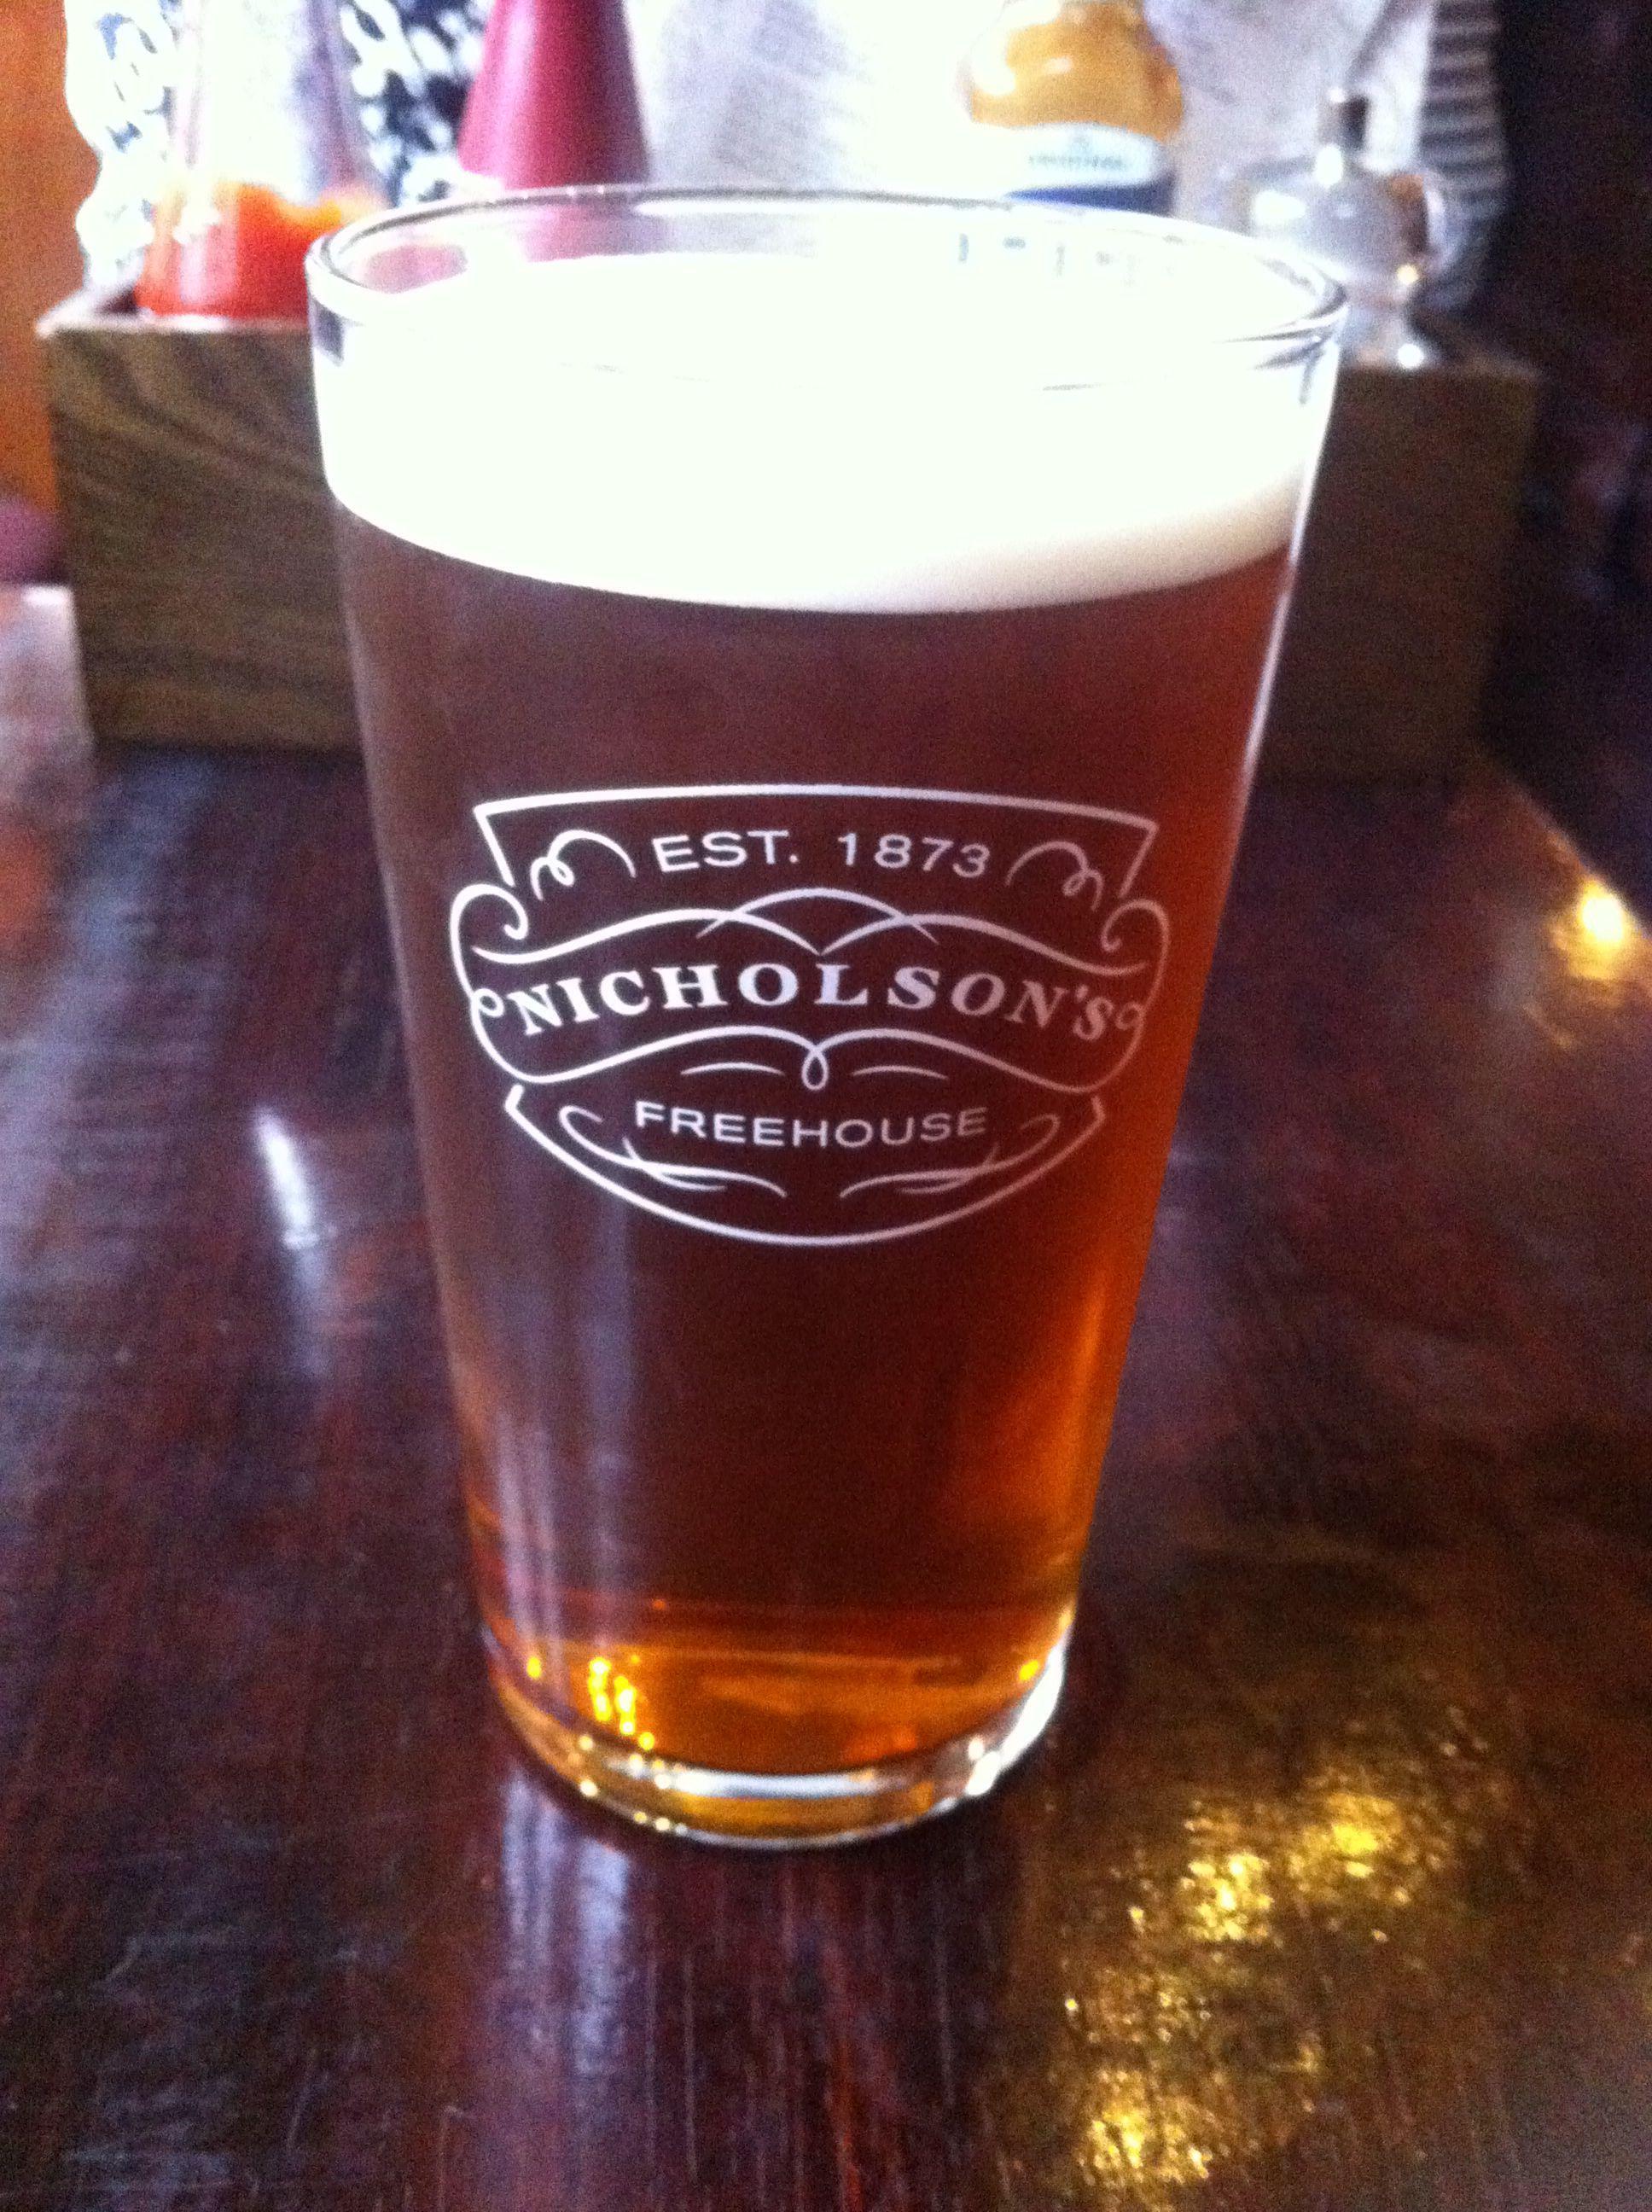 Nicholson S Beer Tasted On Scotland The Kelinworth Pub Beers Of The World Beer Scotland